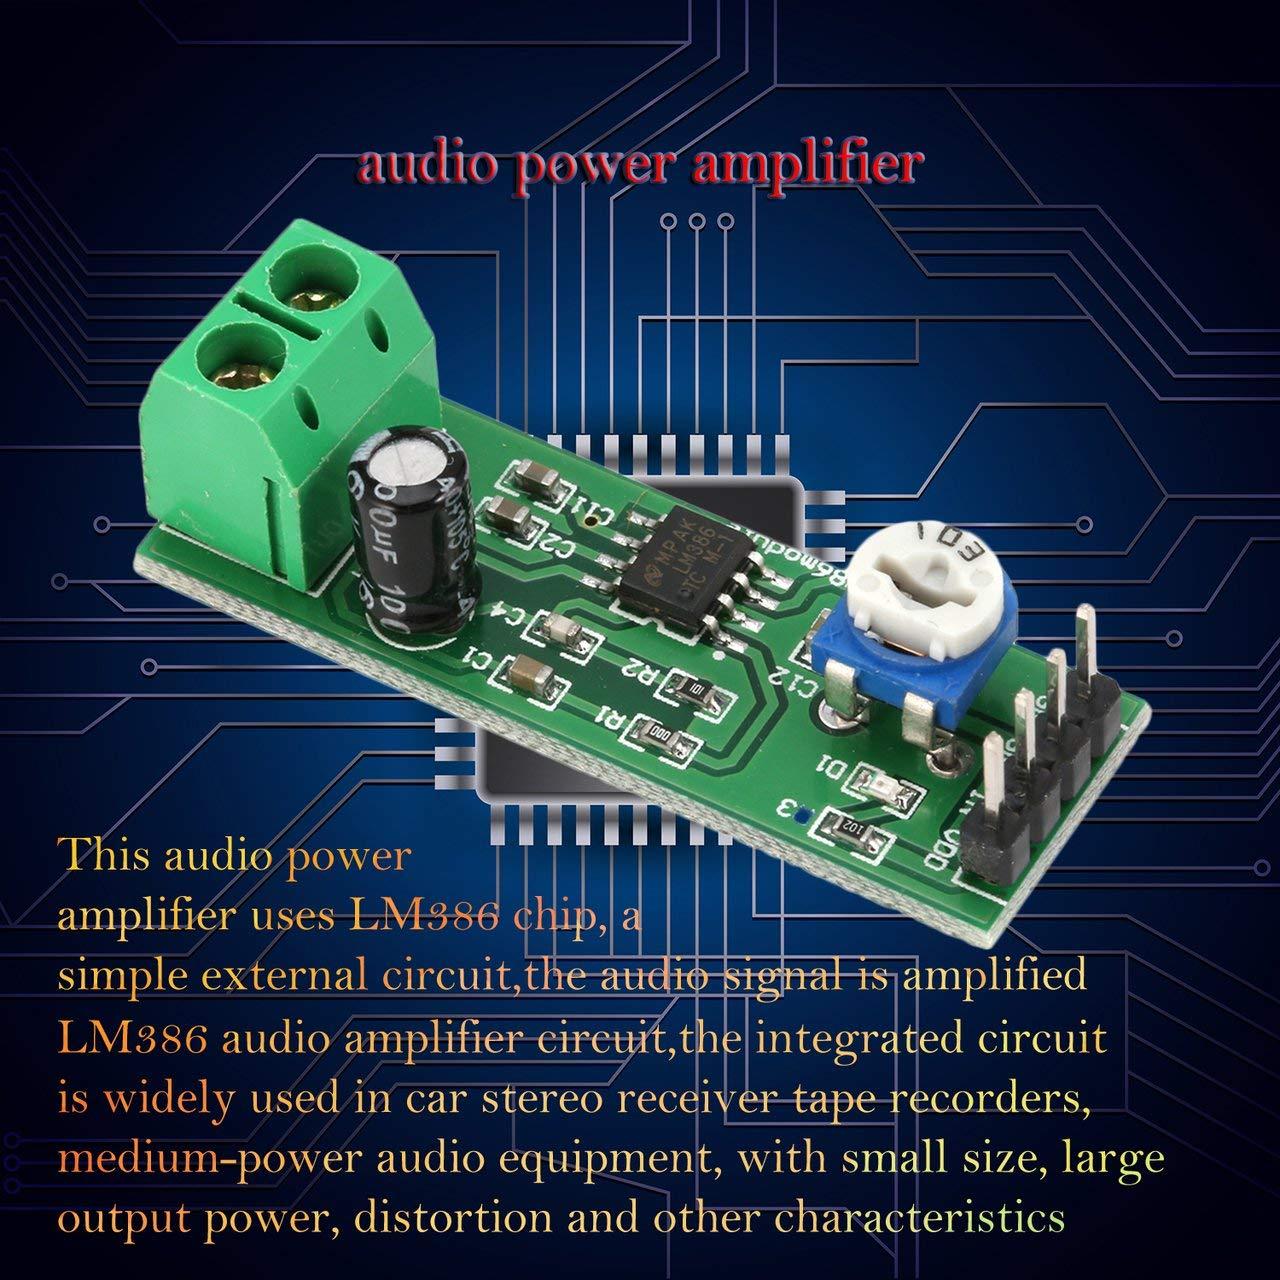 Jasnyfall Lm386 Super Mini Dc 200x Leistungsaudioverstrker Audio Door Phone Circuit Using Platinenmodul Monokanal Grn Baumarkt